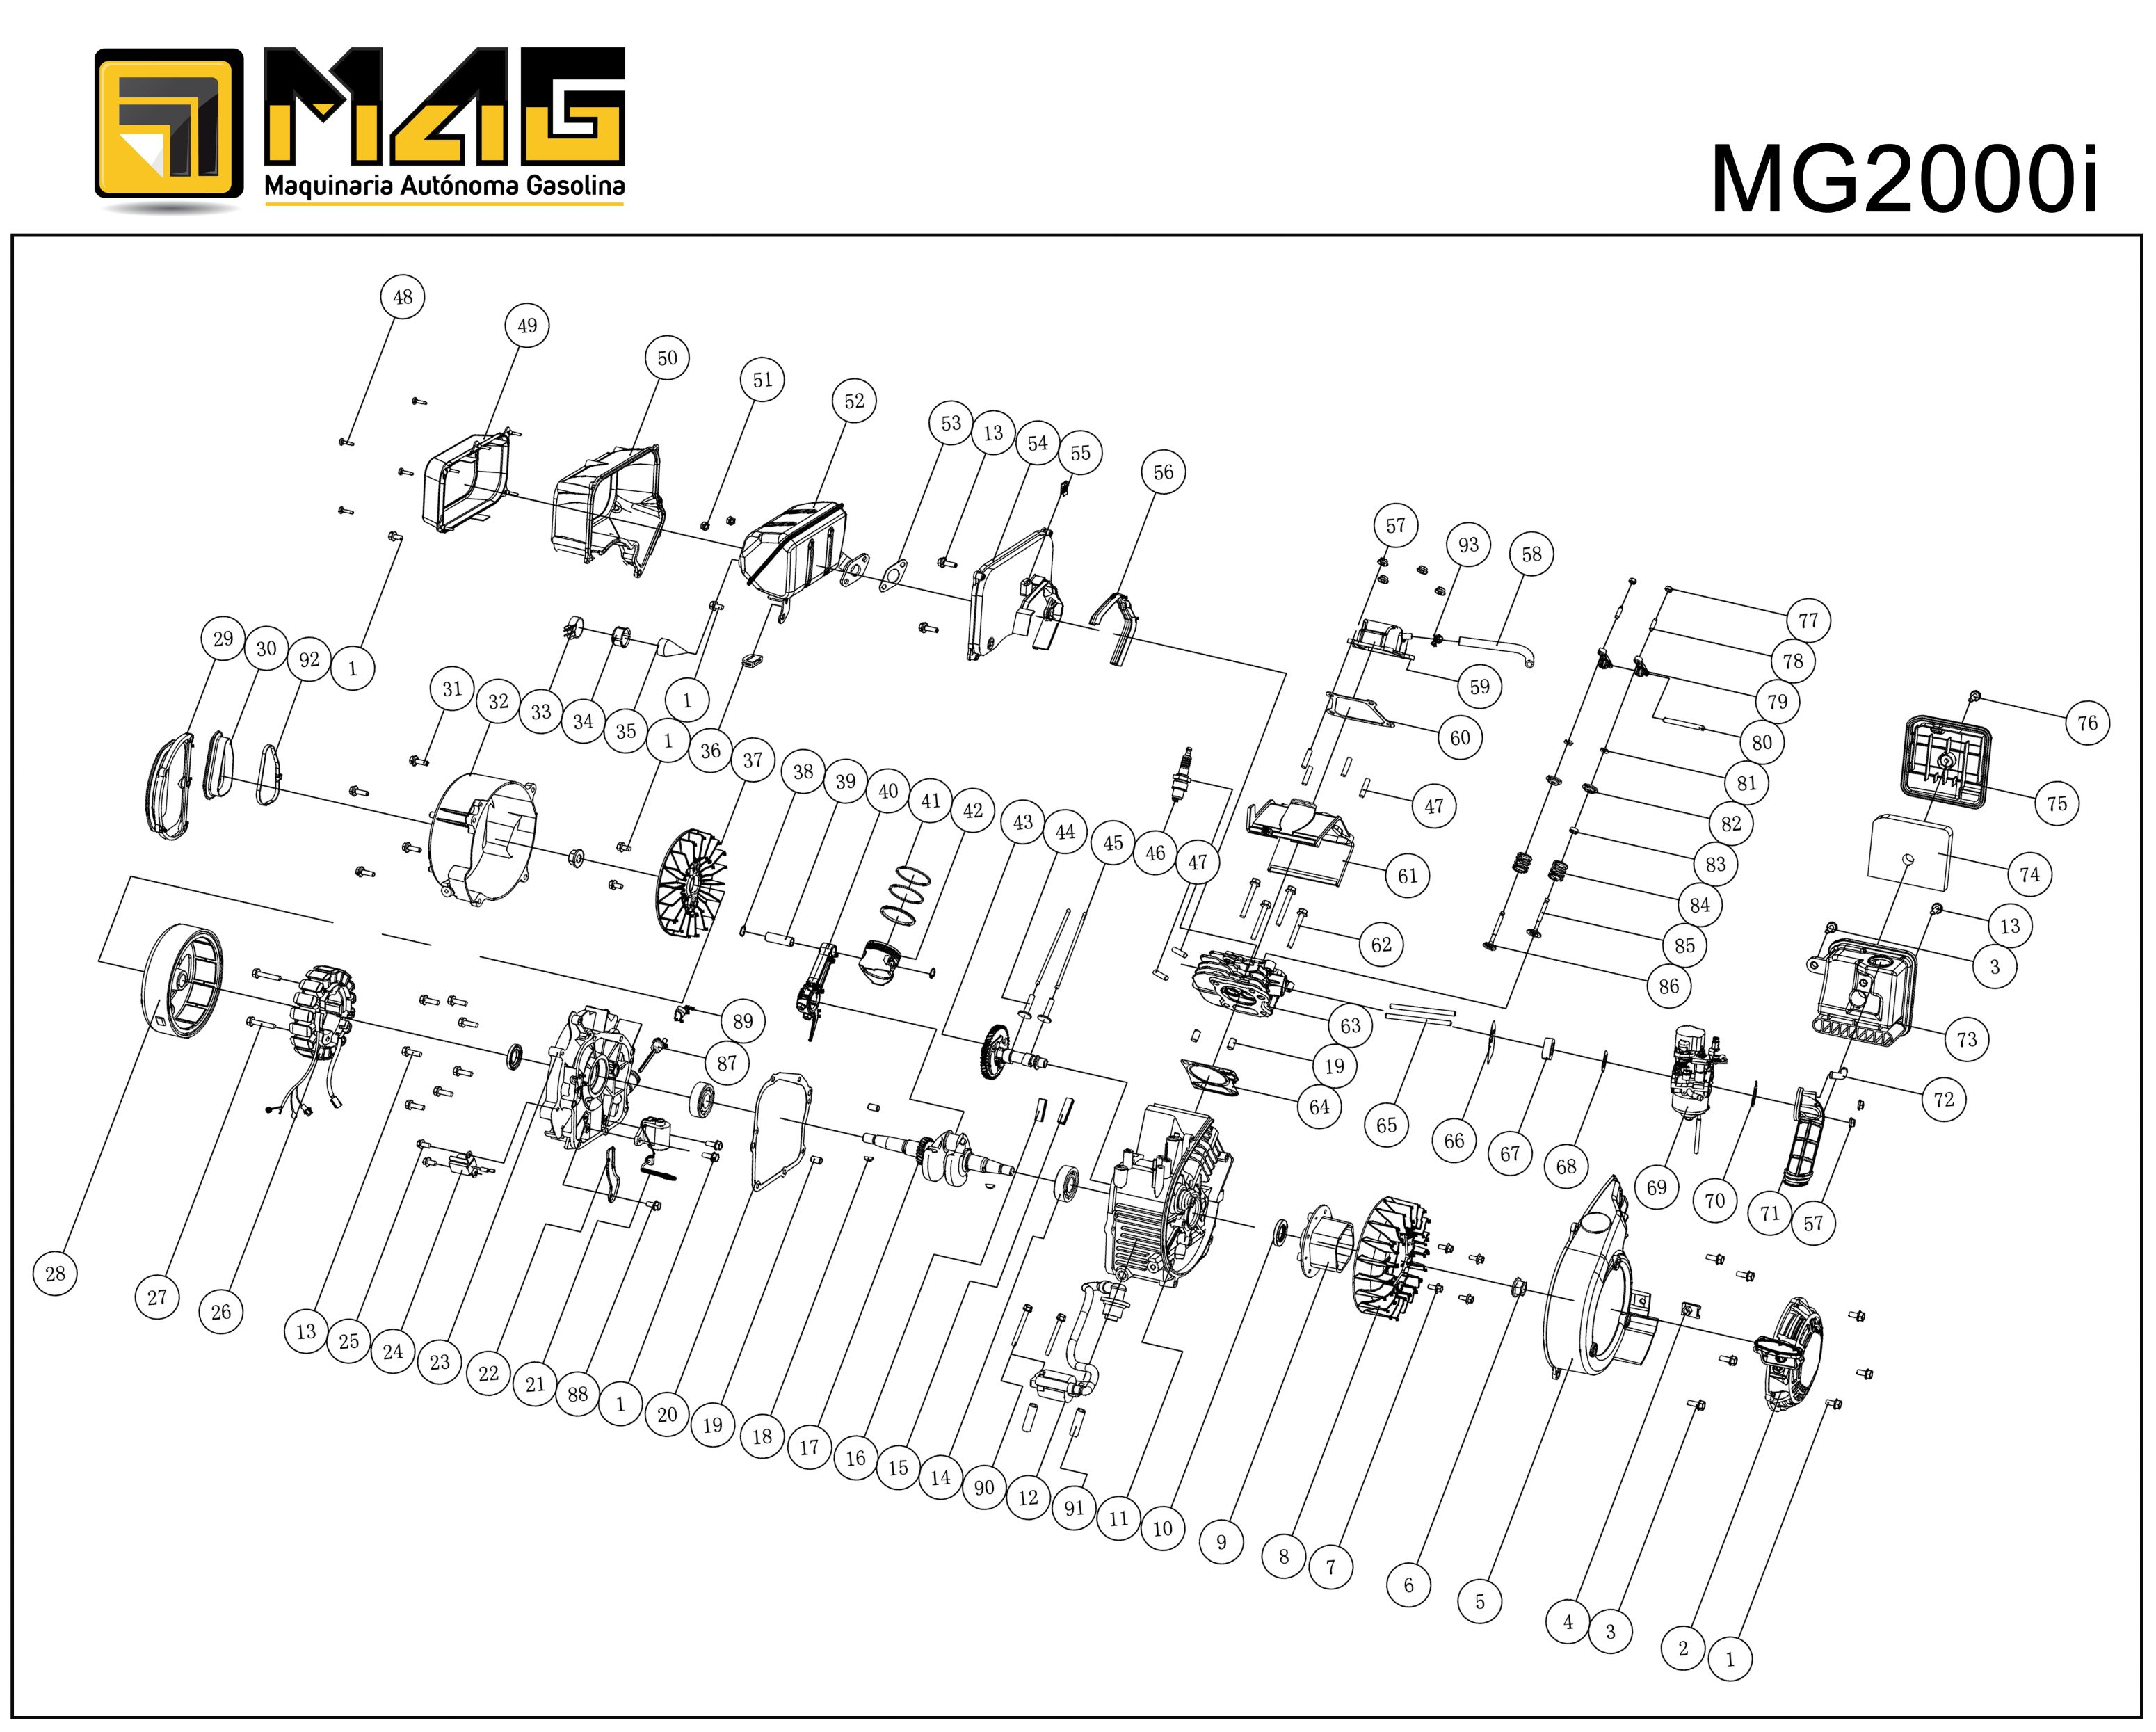 MG2000i Explode Generator